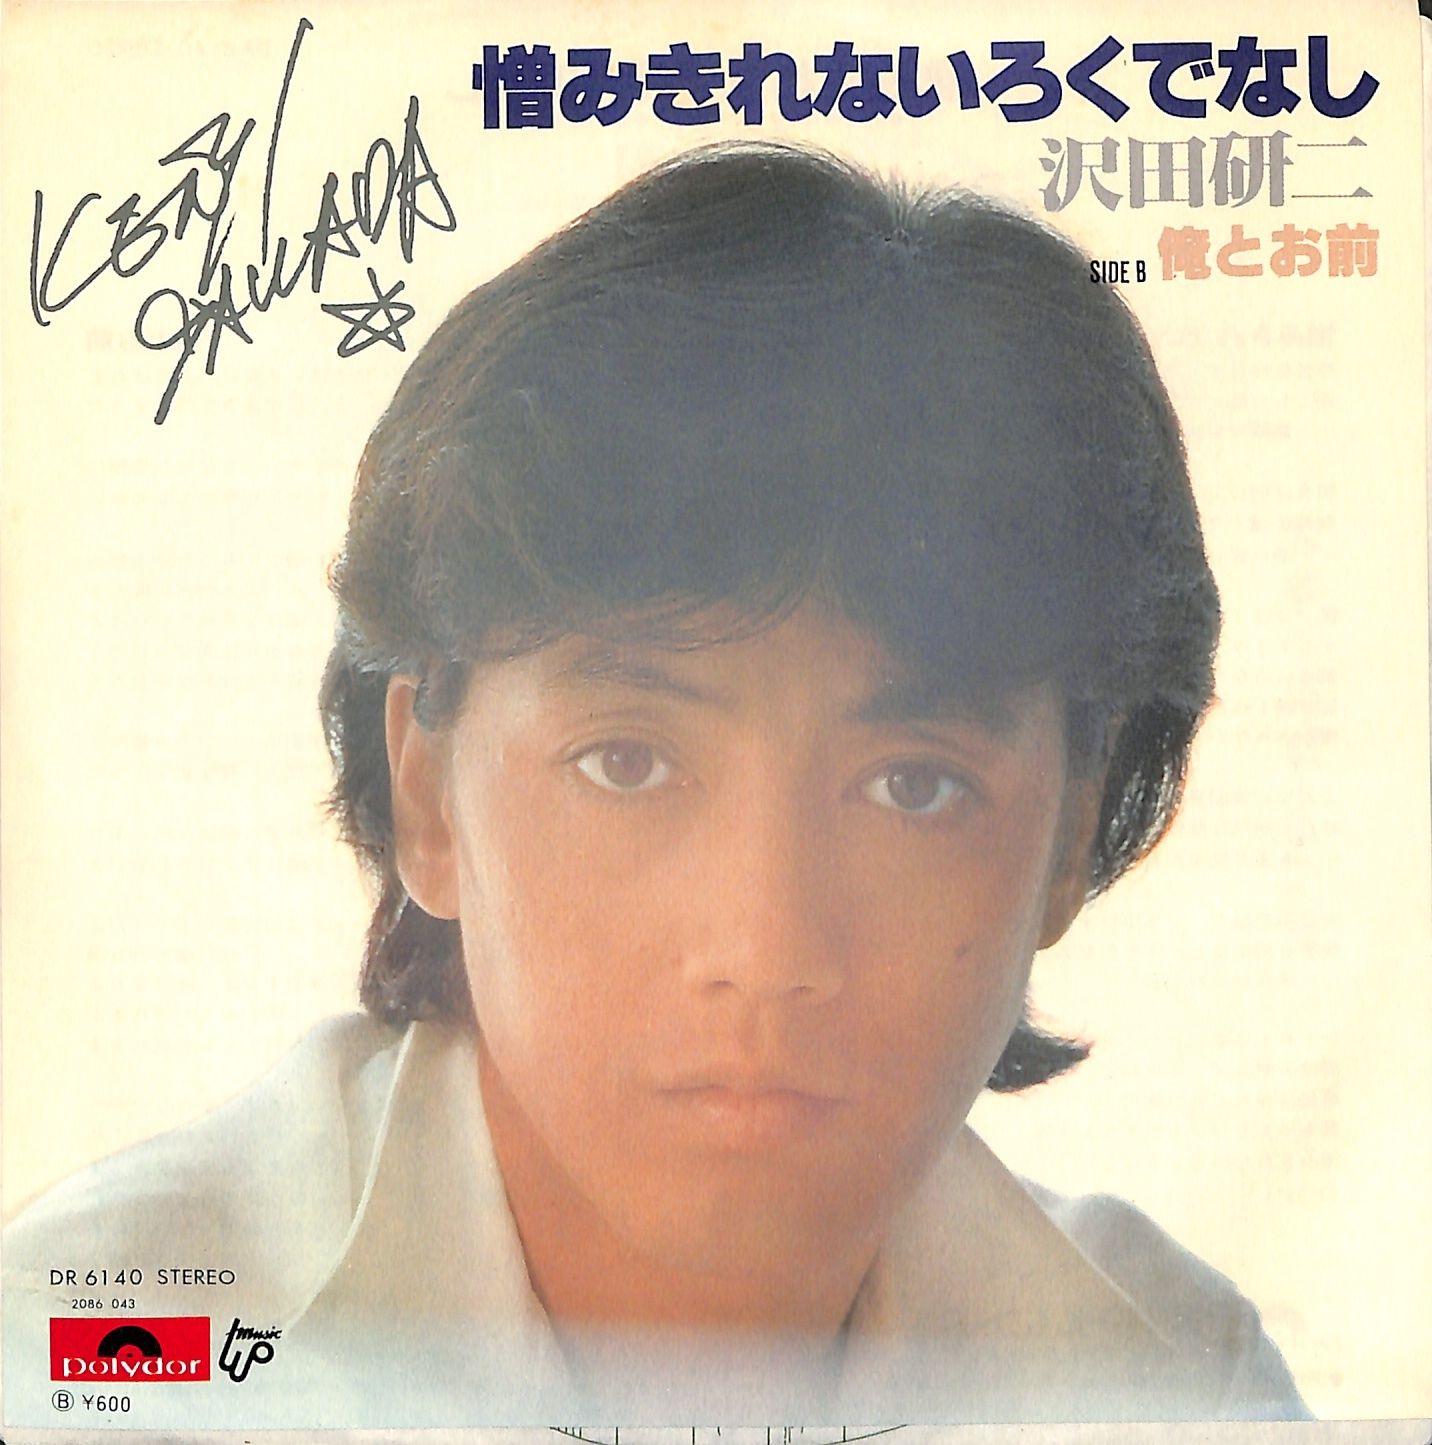 Books Channel Music Shop            沢田研二 / 憎みきれないろくでなし(7inchシングル)